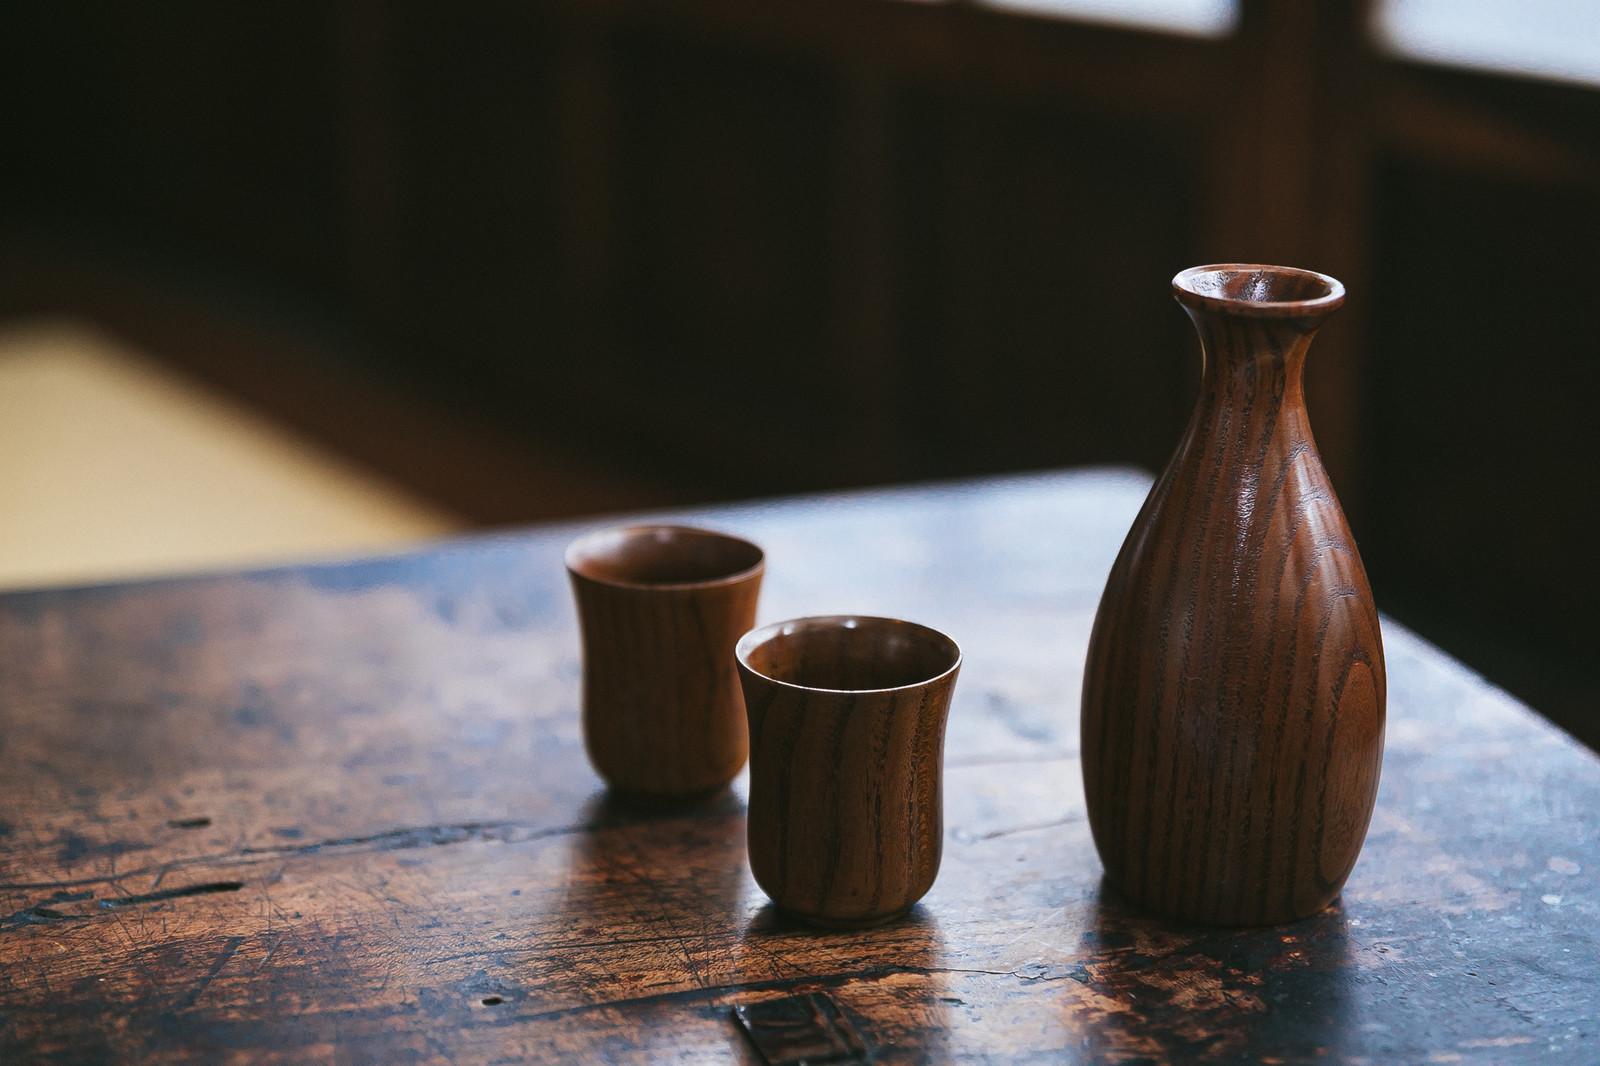 日本酒 薬膳